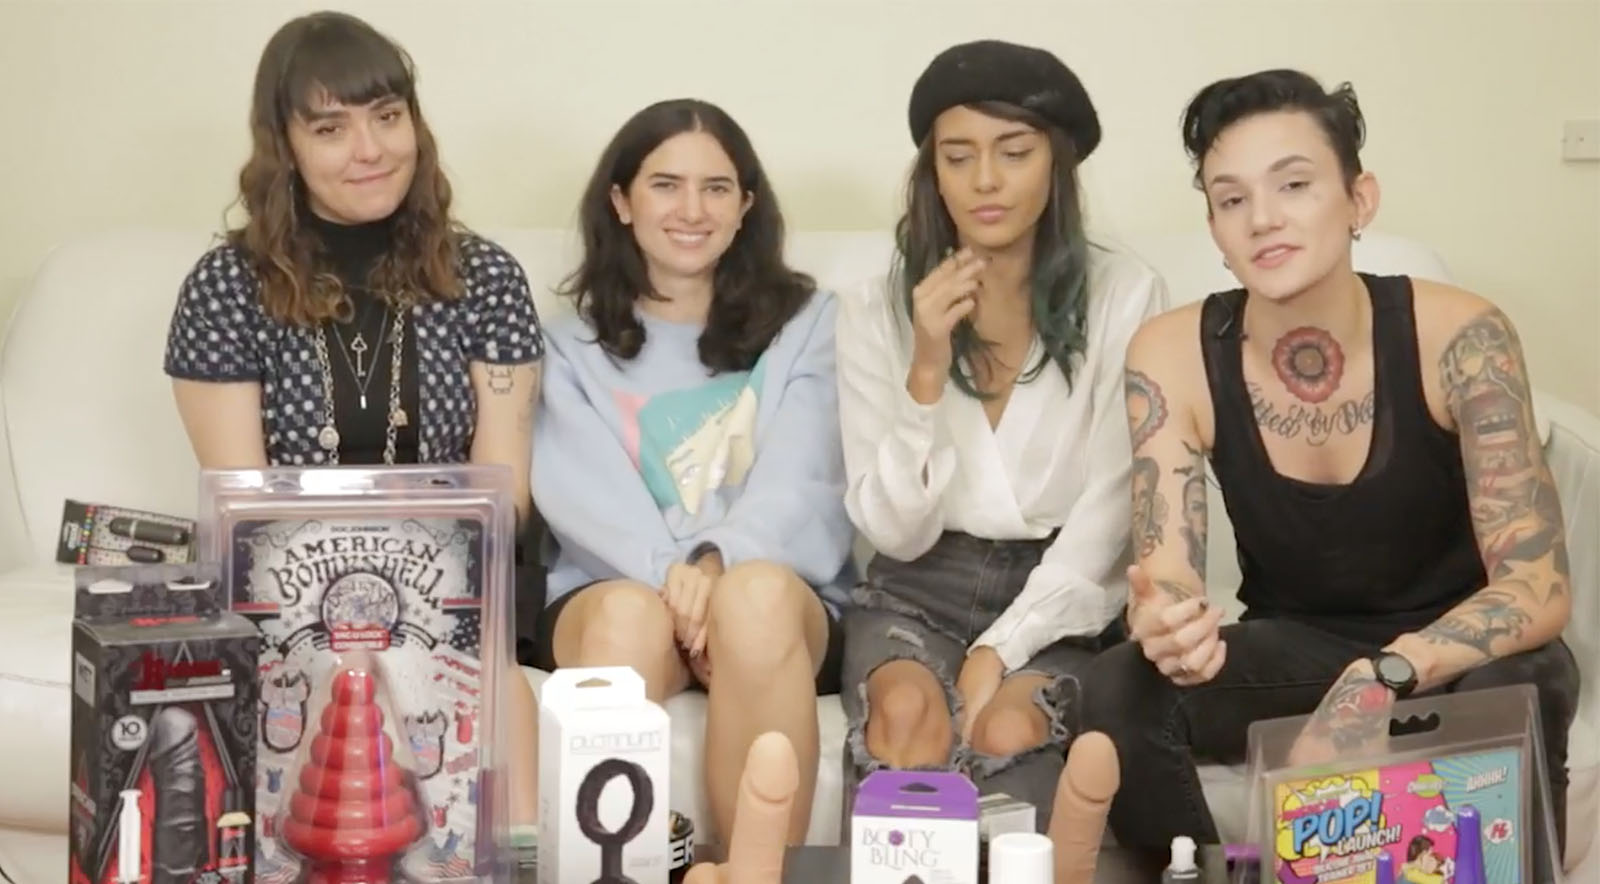 Sex Week: Nikki Hearts & Friends Share Their Best Stoned Sex Stories